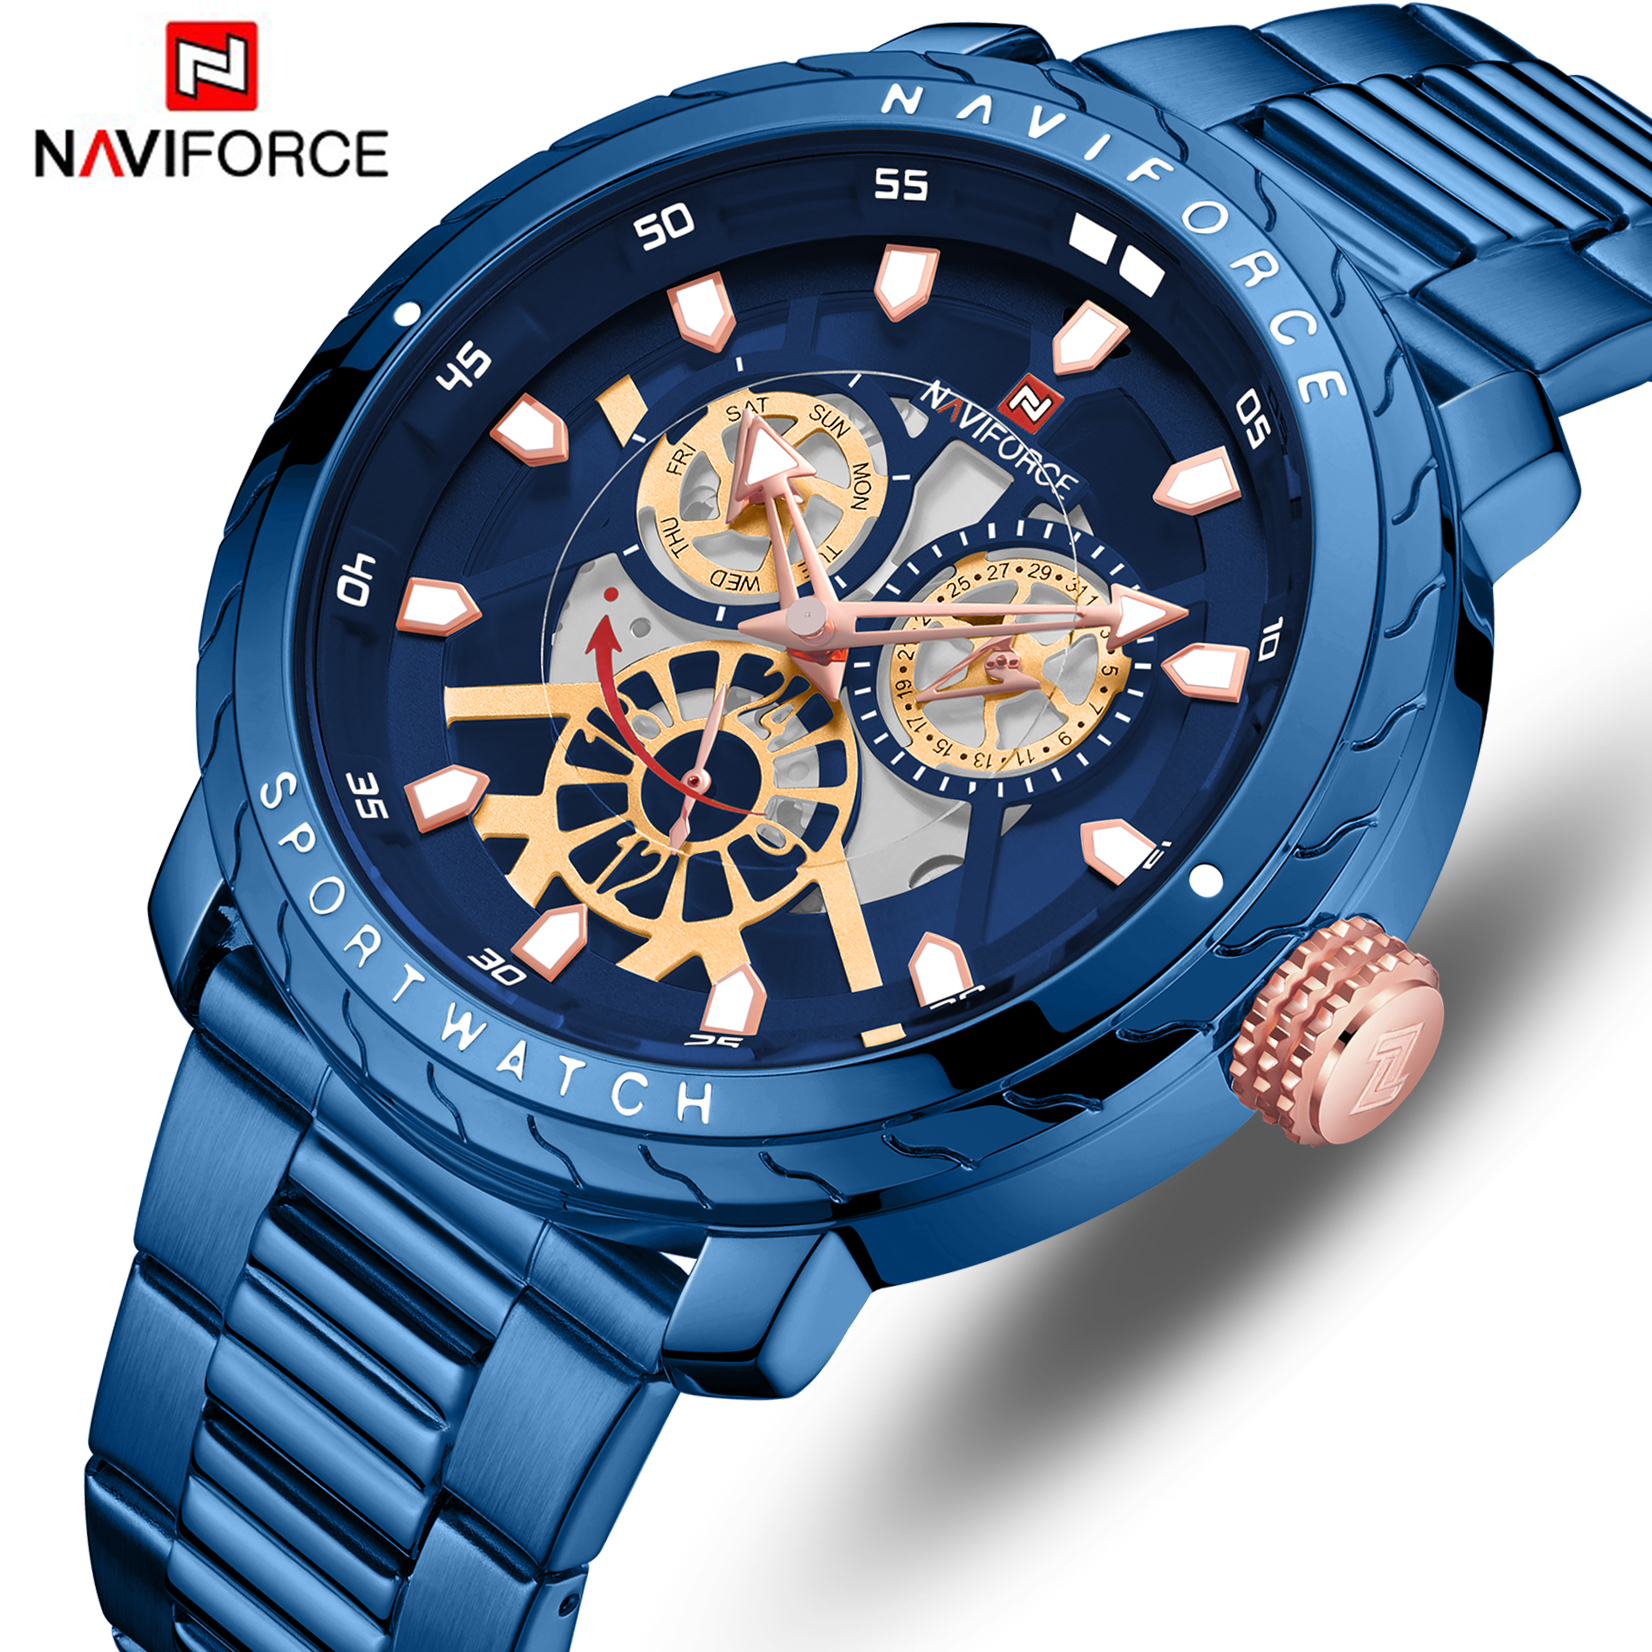 NAVIFORCE Men Watch Top Brand Luxury Quartz Mens Watches Waterproof Date Clock Male Sports Steel Wrist Watch Relogio Masculino